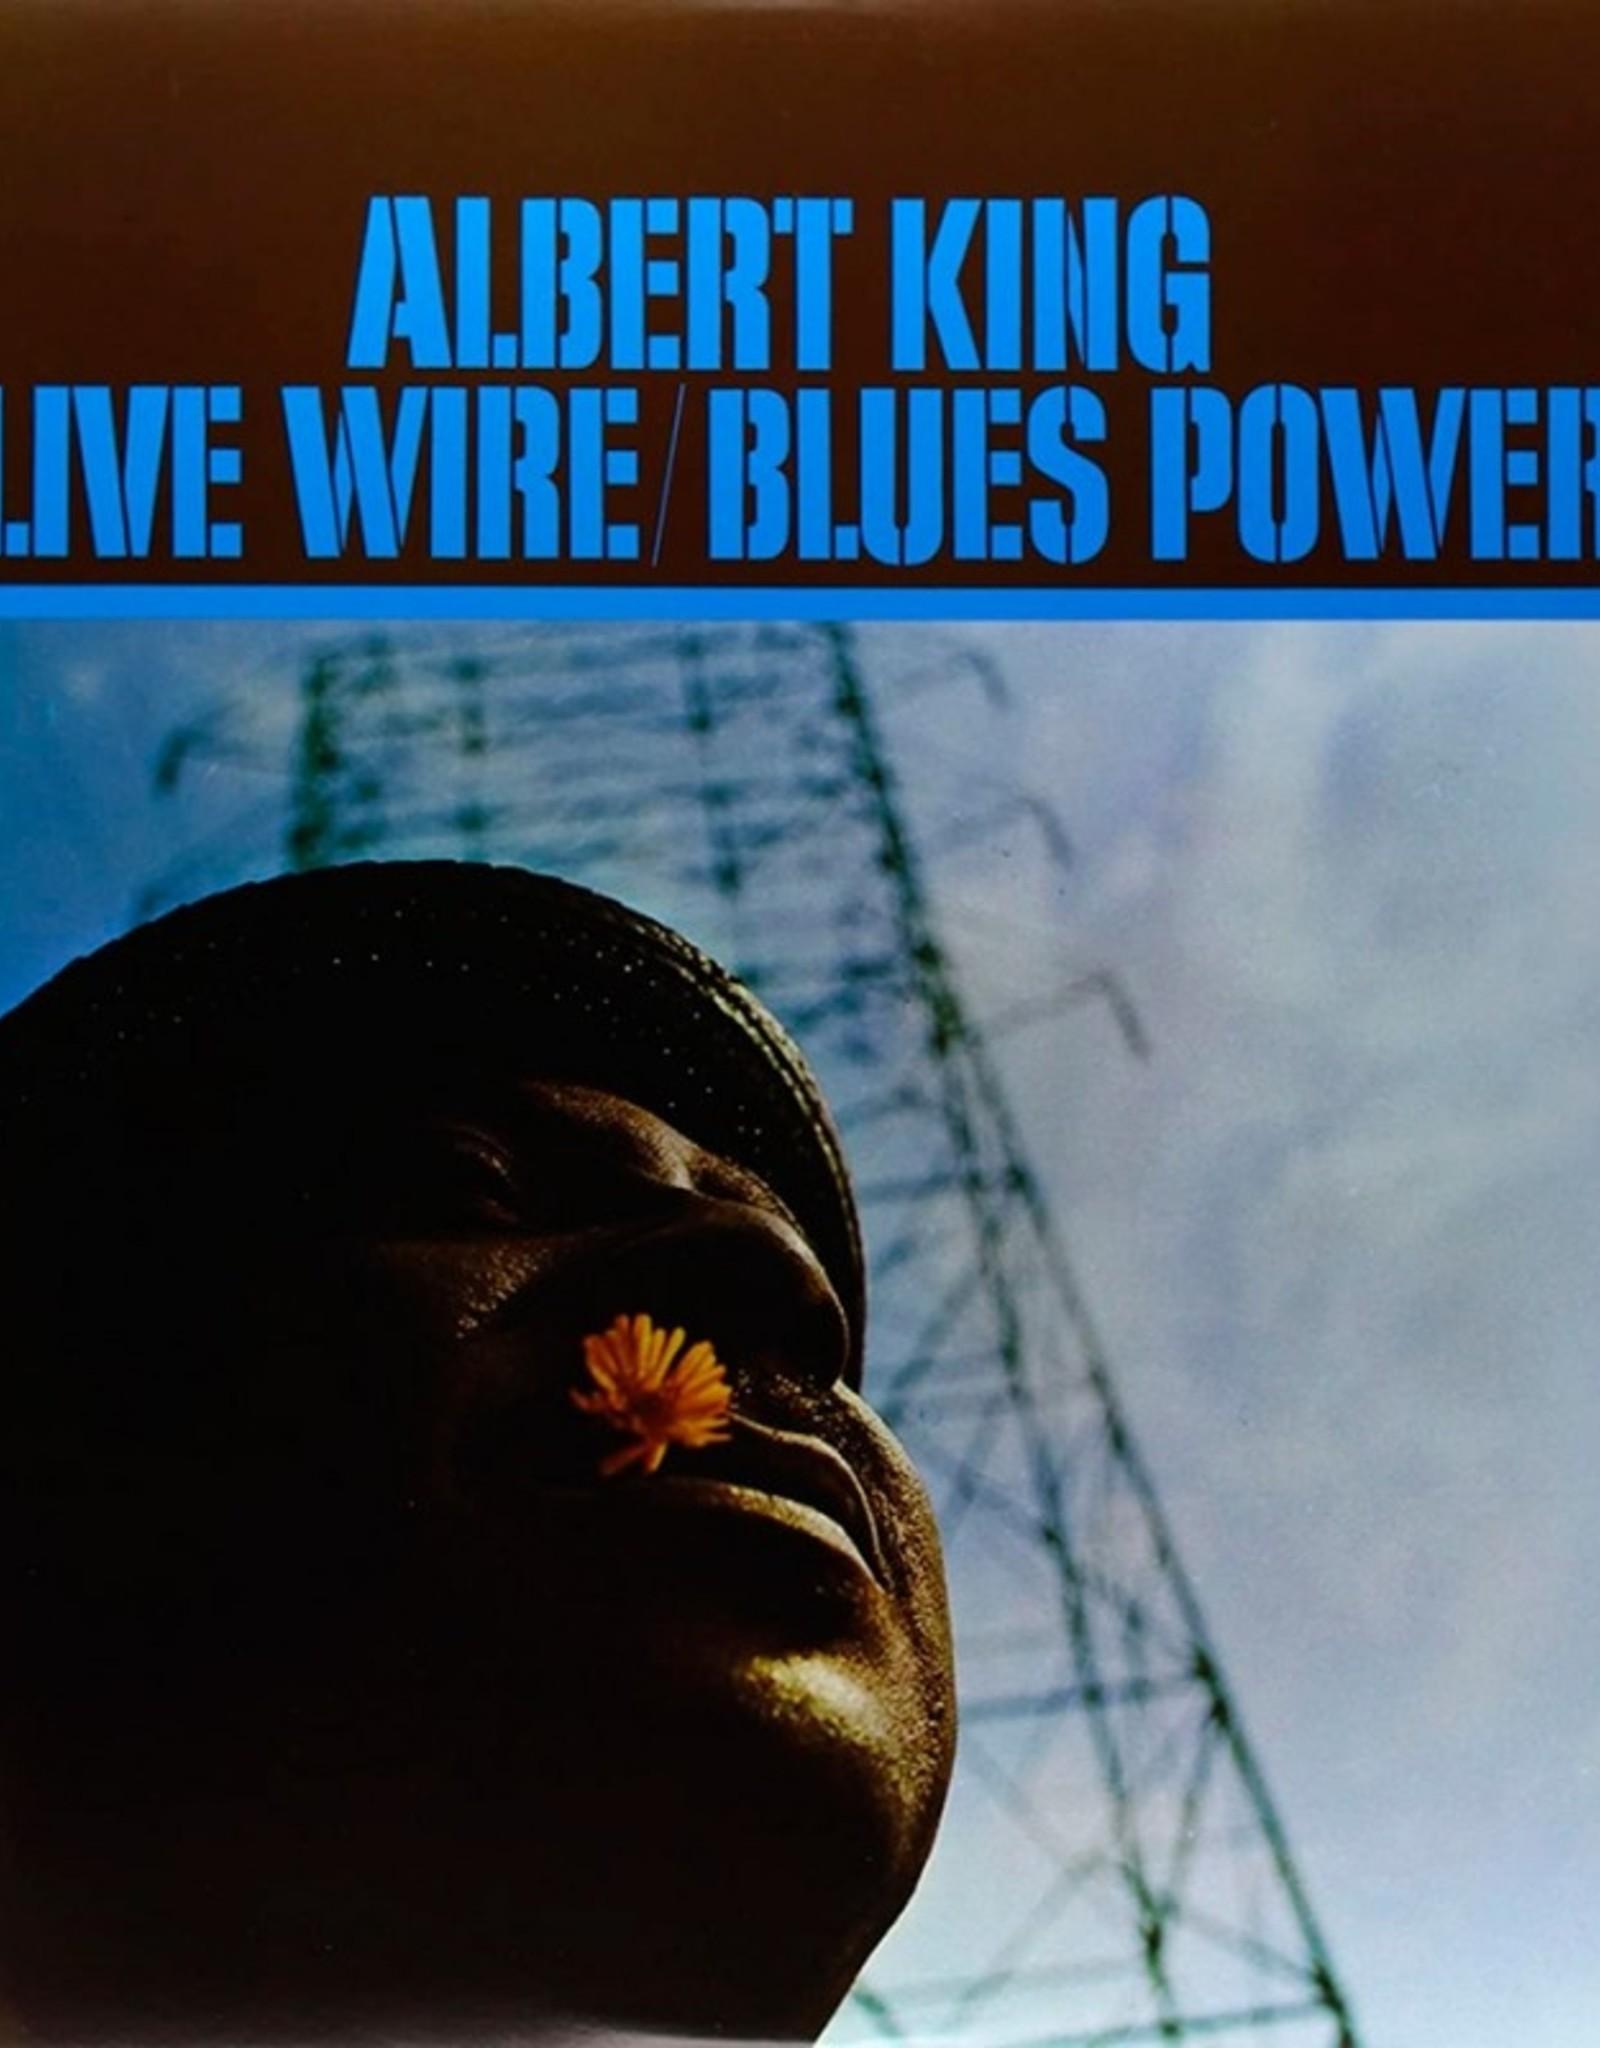 Albert King - Live Wire / Blues Power